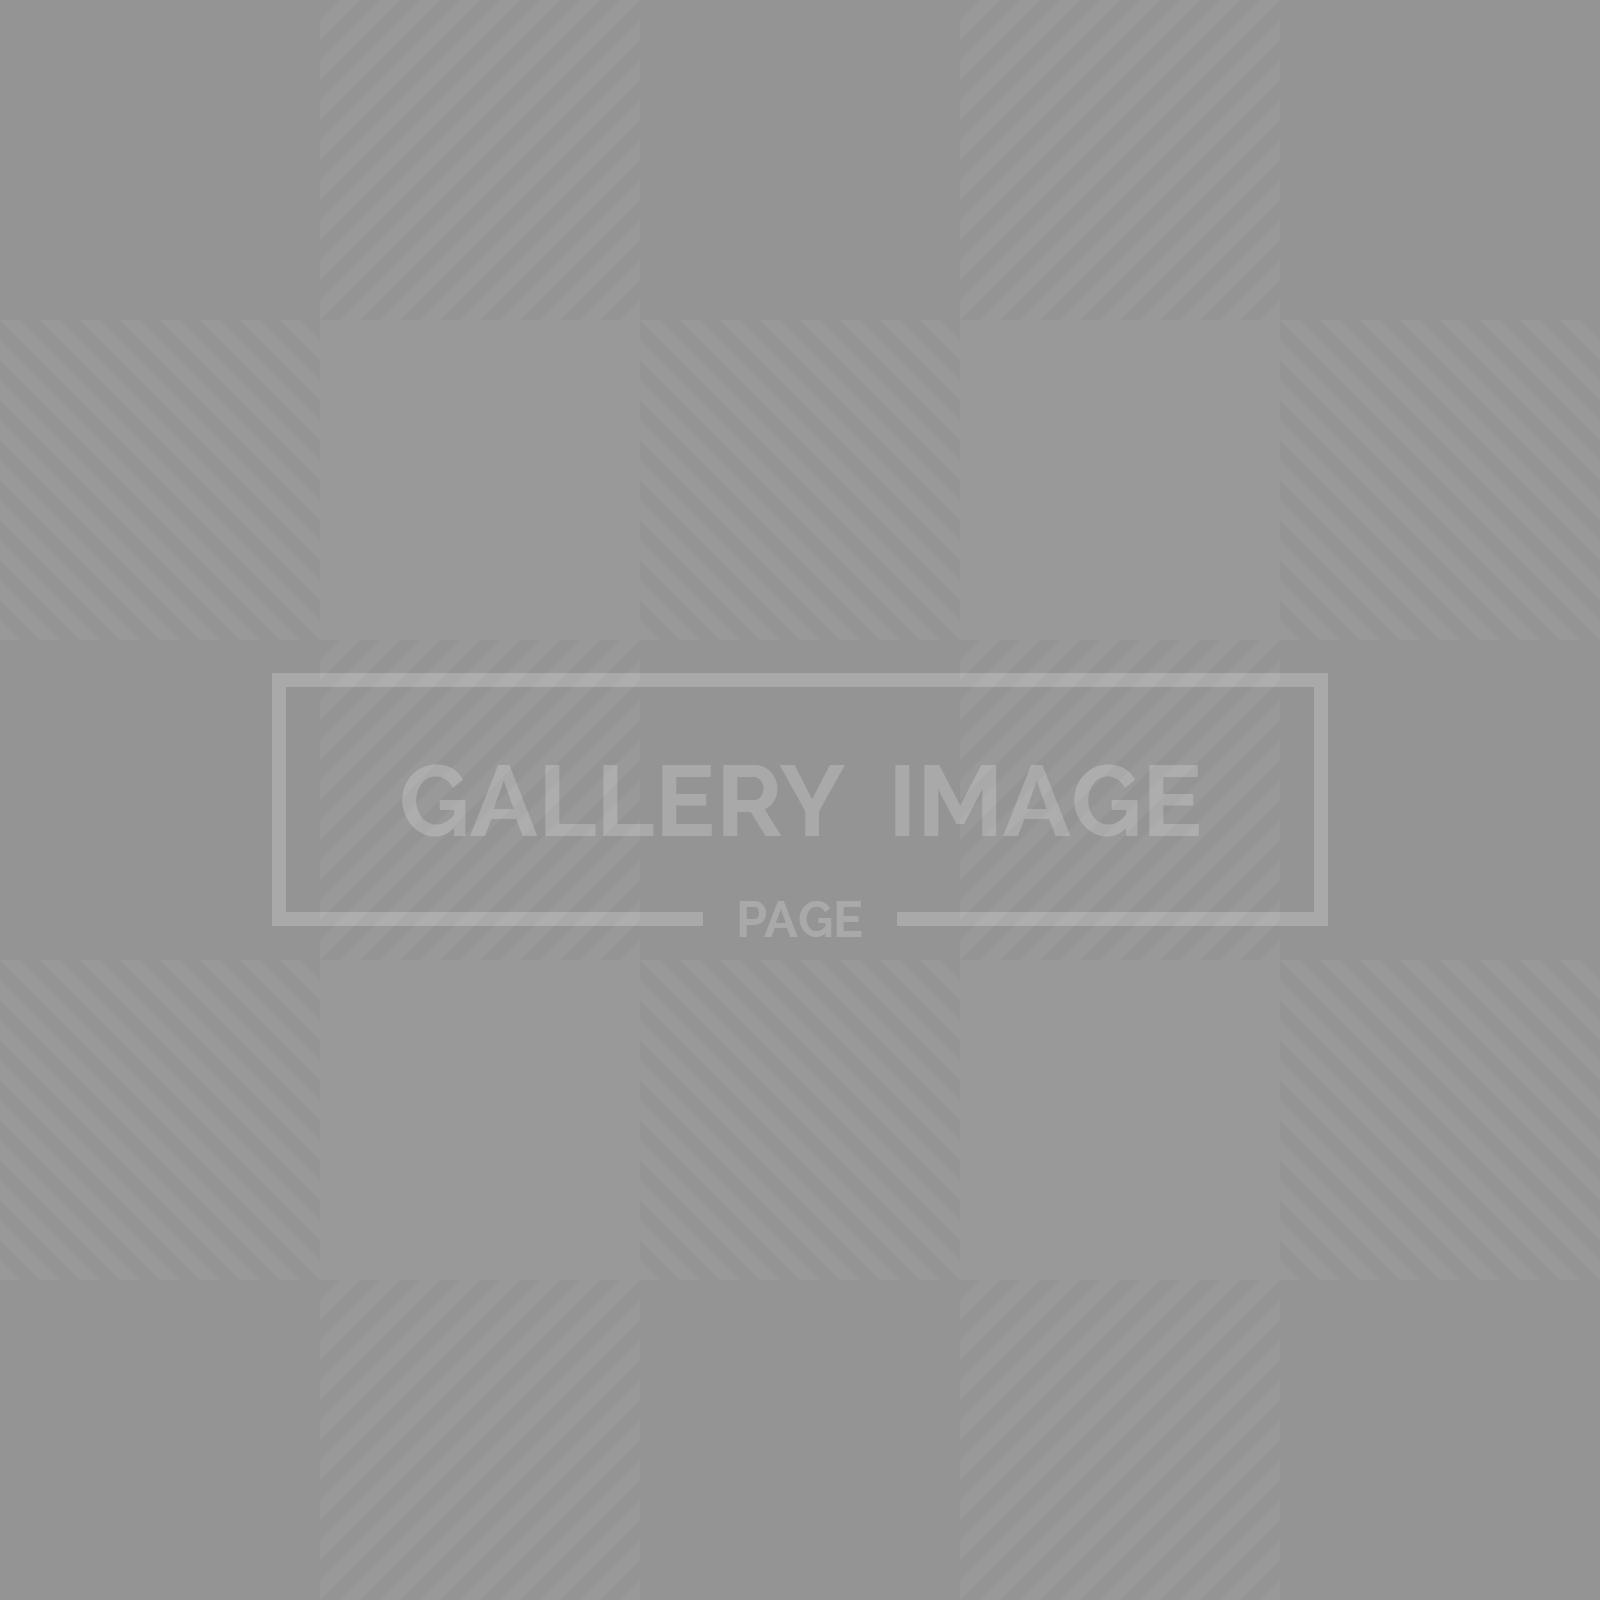 005_gallery